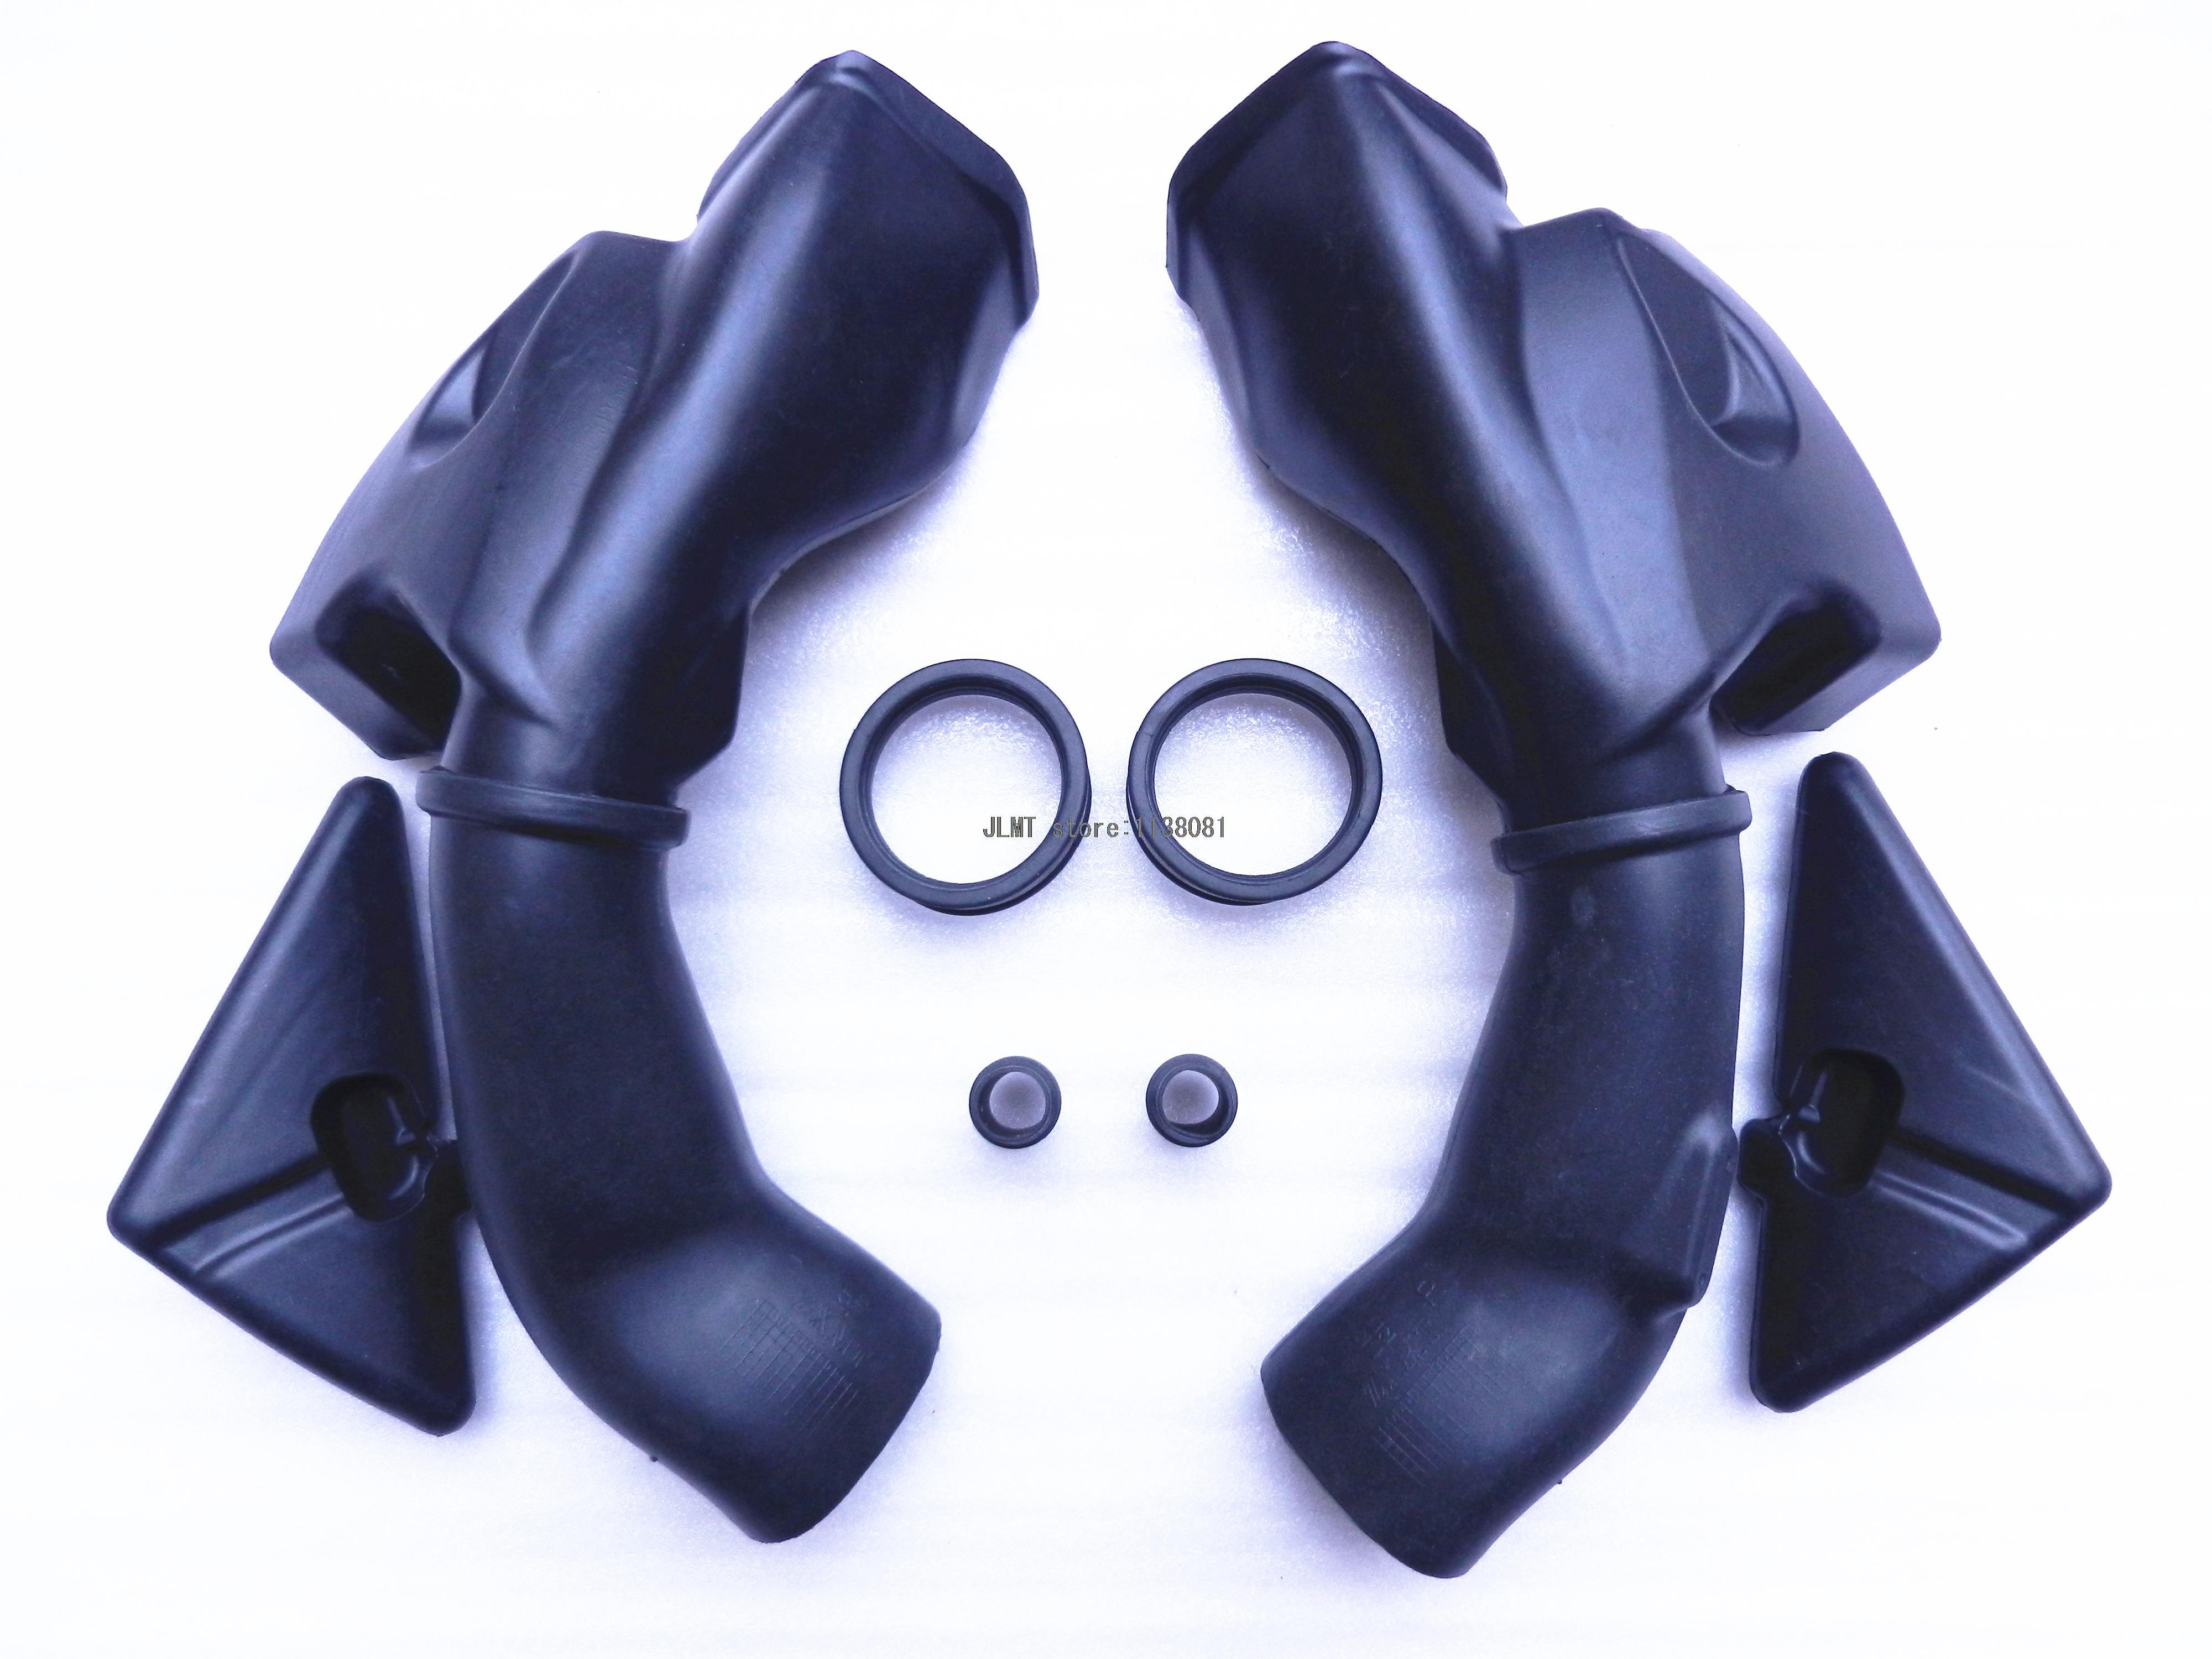 Ram Air Intake Tube Duct for Honda CBR600RR CBR600 CBR 600 RR 2003 2004 03 04 new motorcycle ram air intake tube duct for suzuki gsxr600 gsxr750 2006 2007 k6 abs plastic black